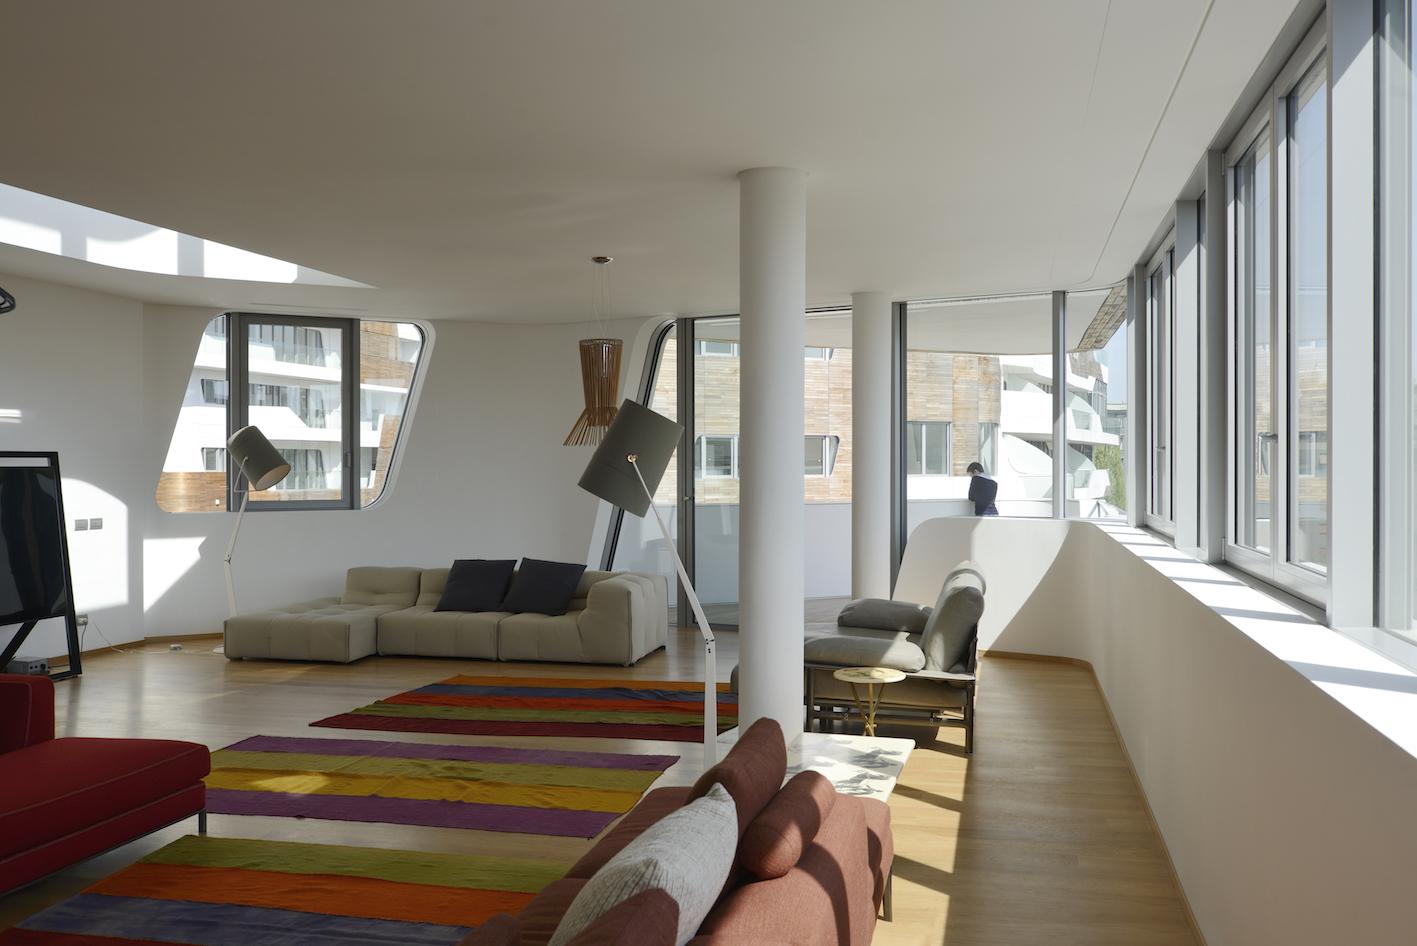 Citylife milano hadid libeskind residenze klat for Attico libeskind milano